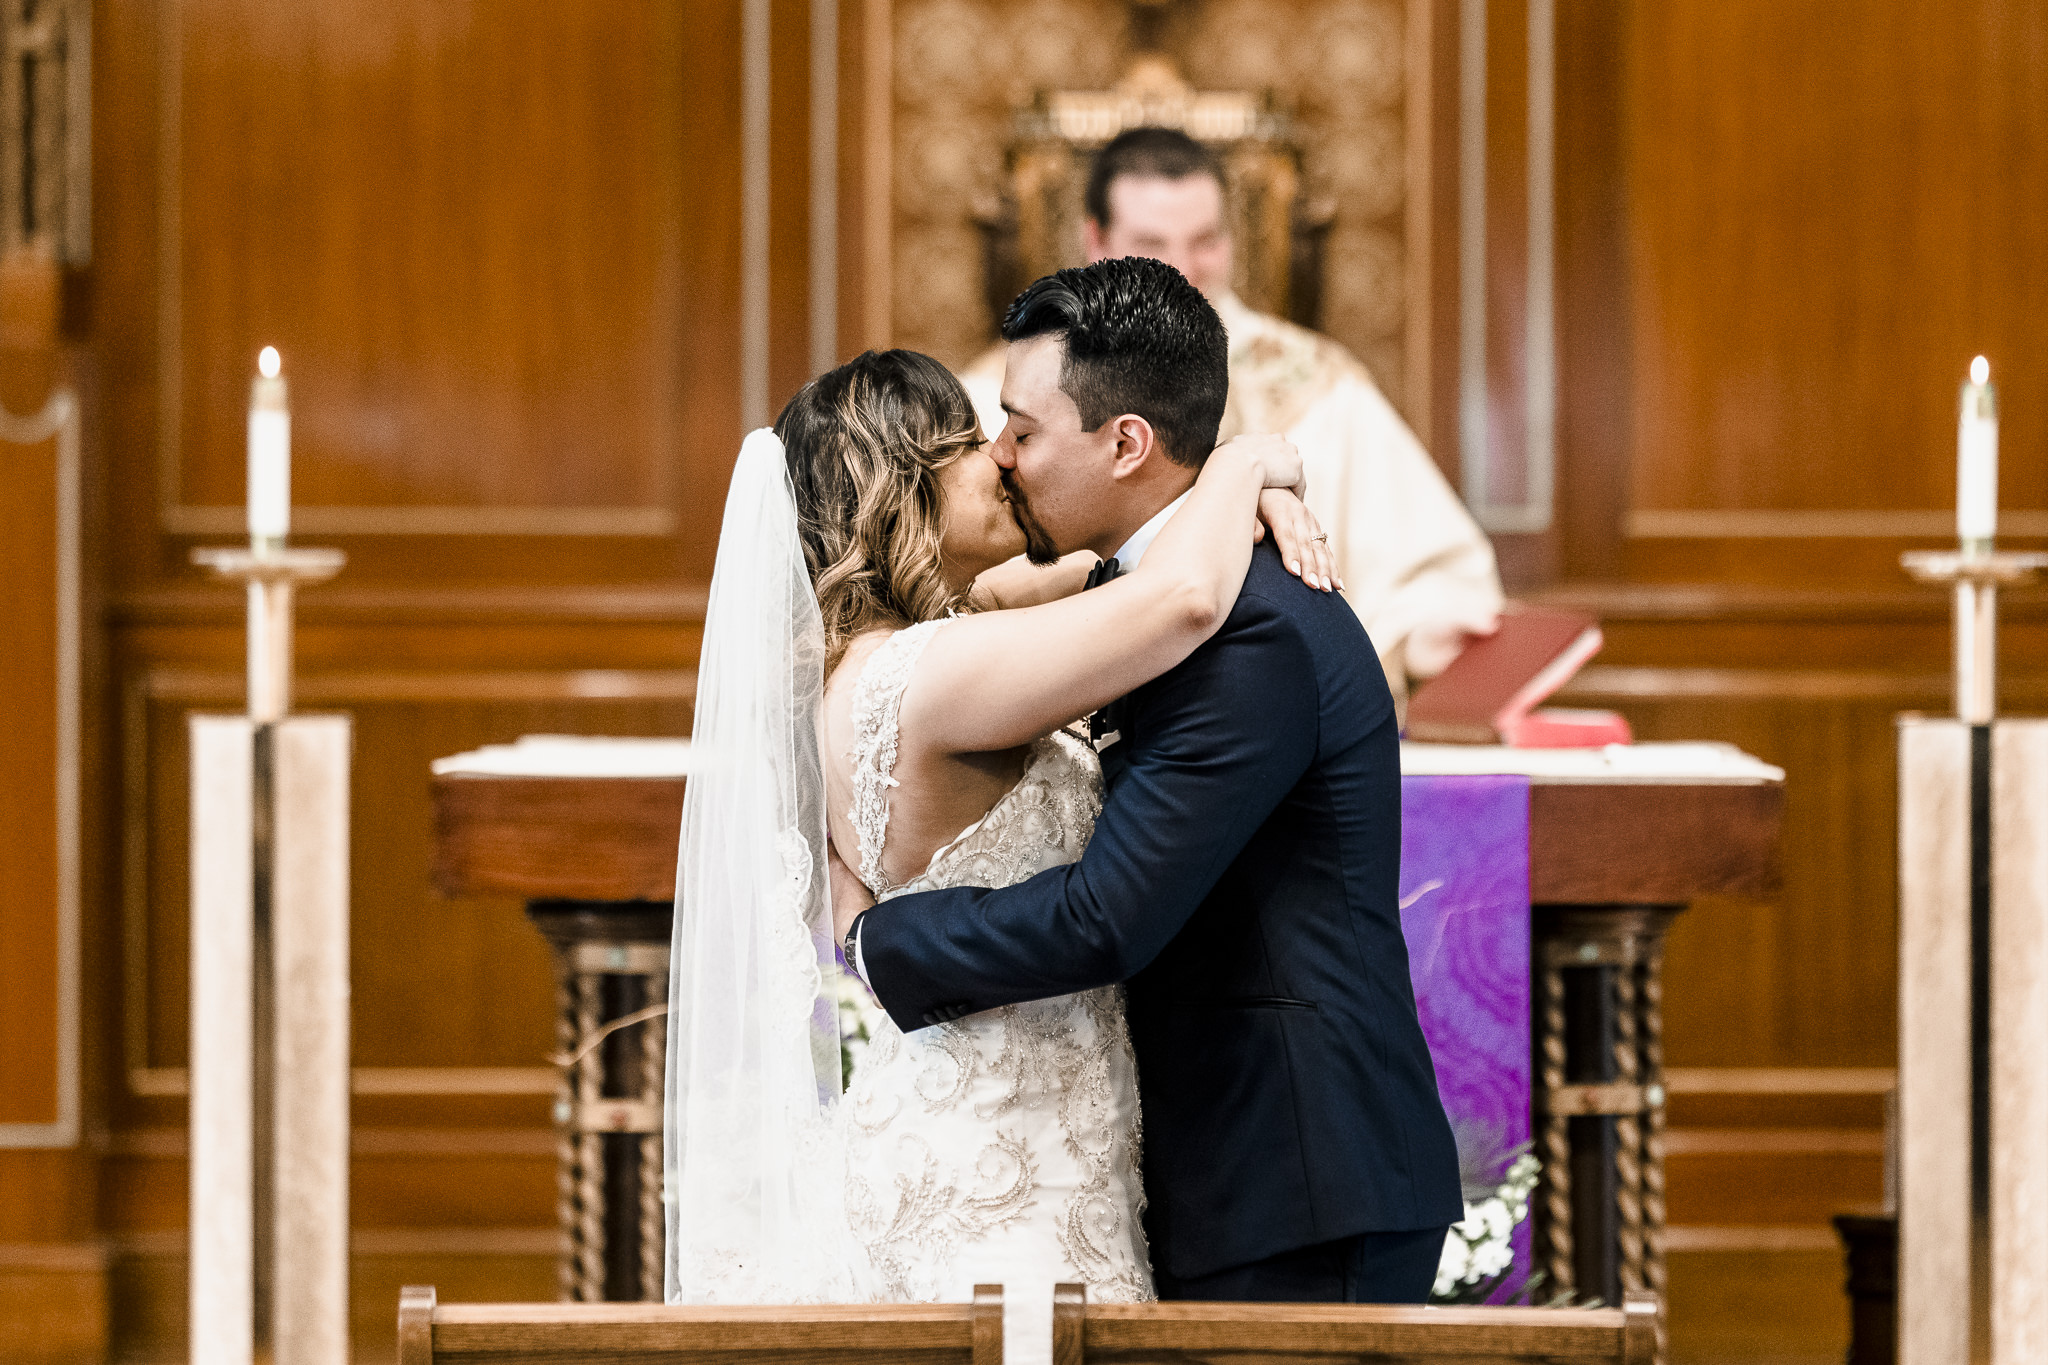 Sanchez-Leonards-Palazzo-New-York-Wedding-Photographer-22.JPG